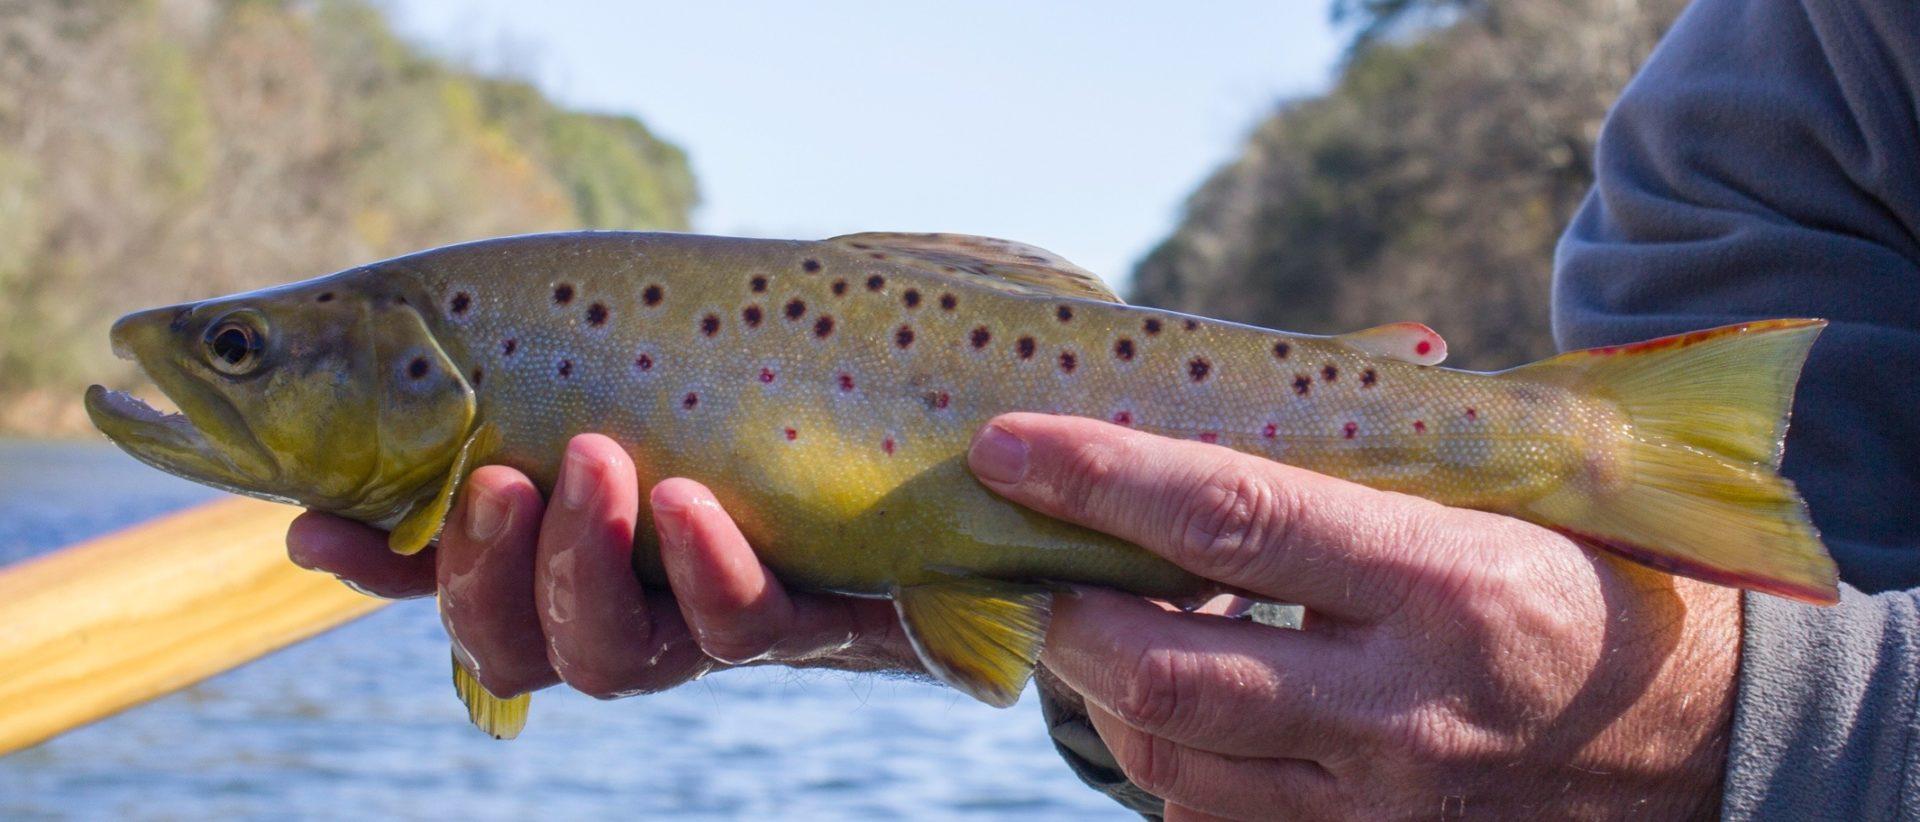 Atlanta fly fishing guide trips chattahoochee river for Georgia trout fishing map